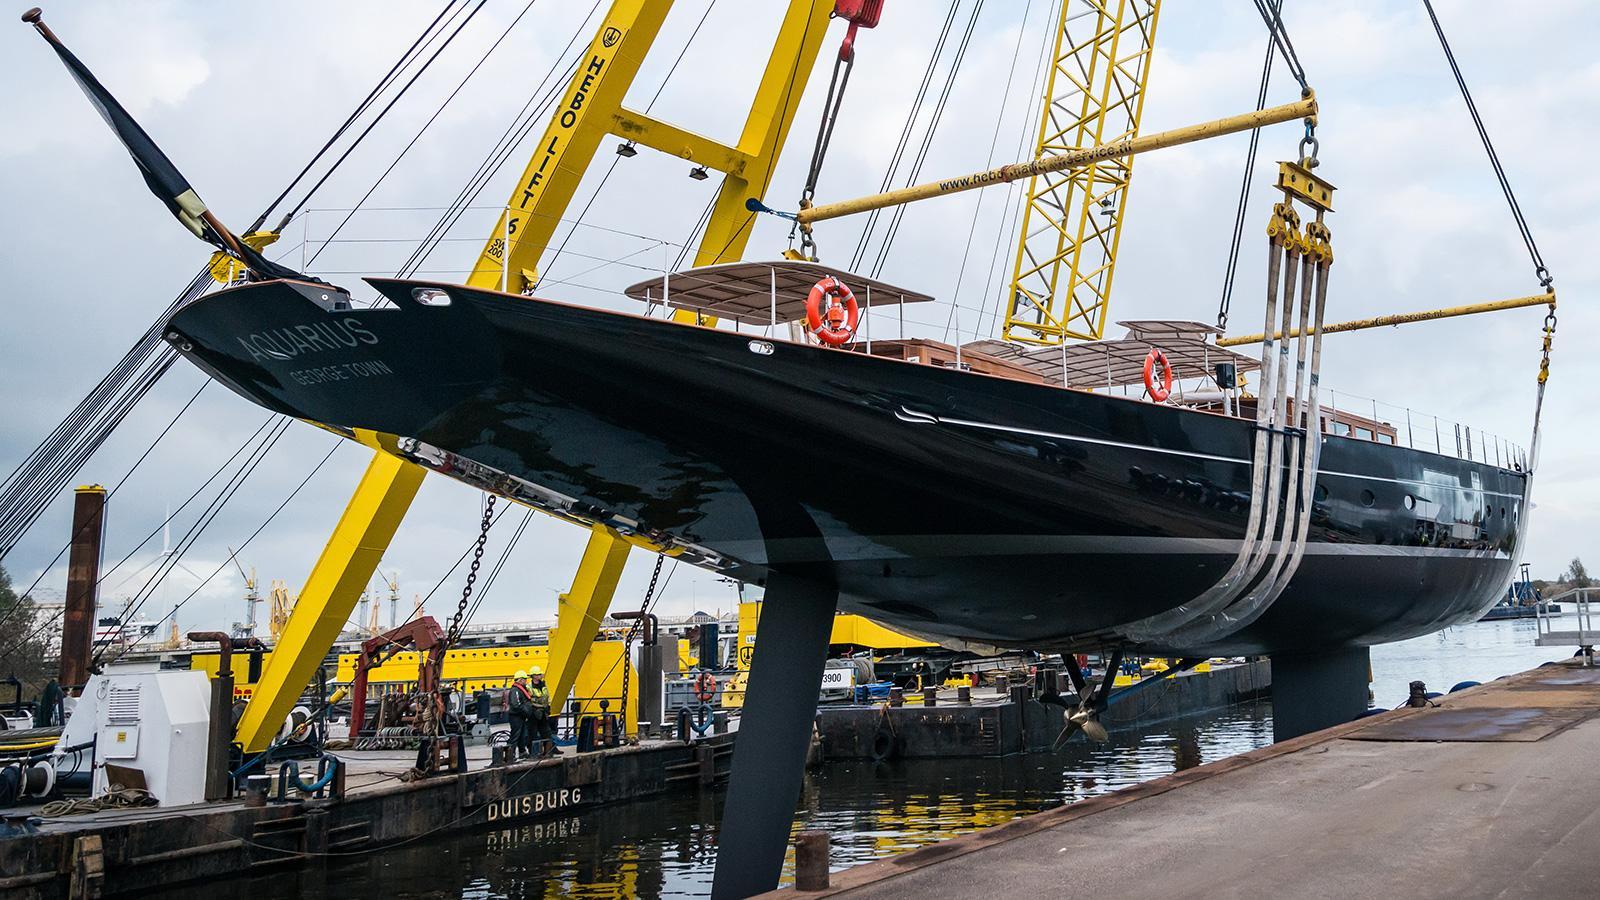 aquarius sailing yacht royal huisman 56m 2018 launch half stern